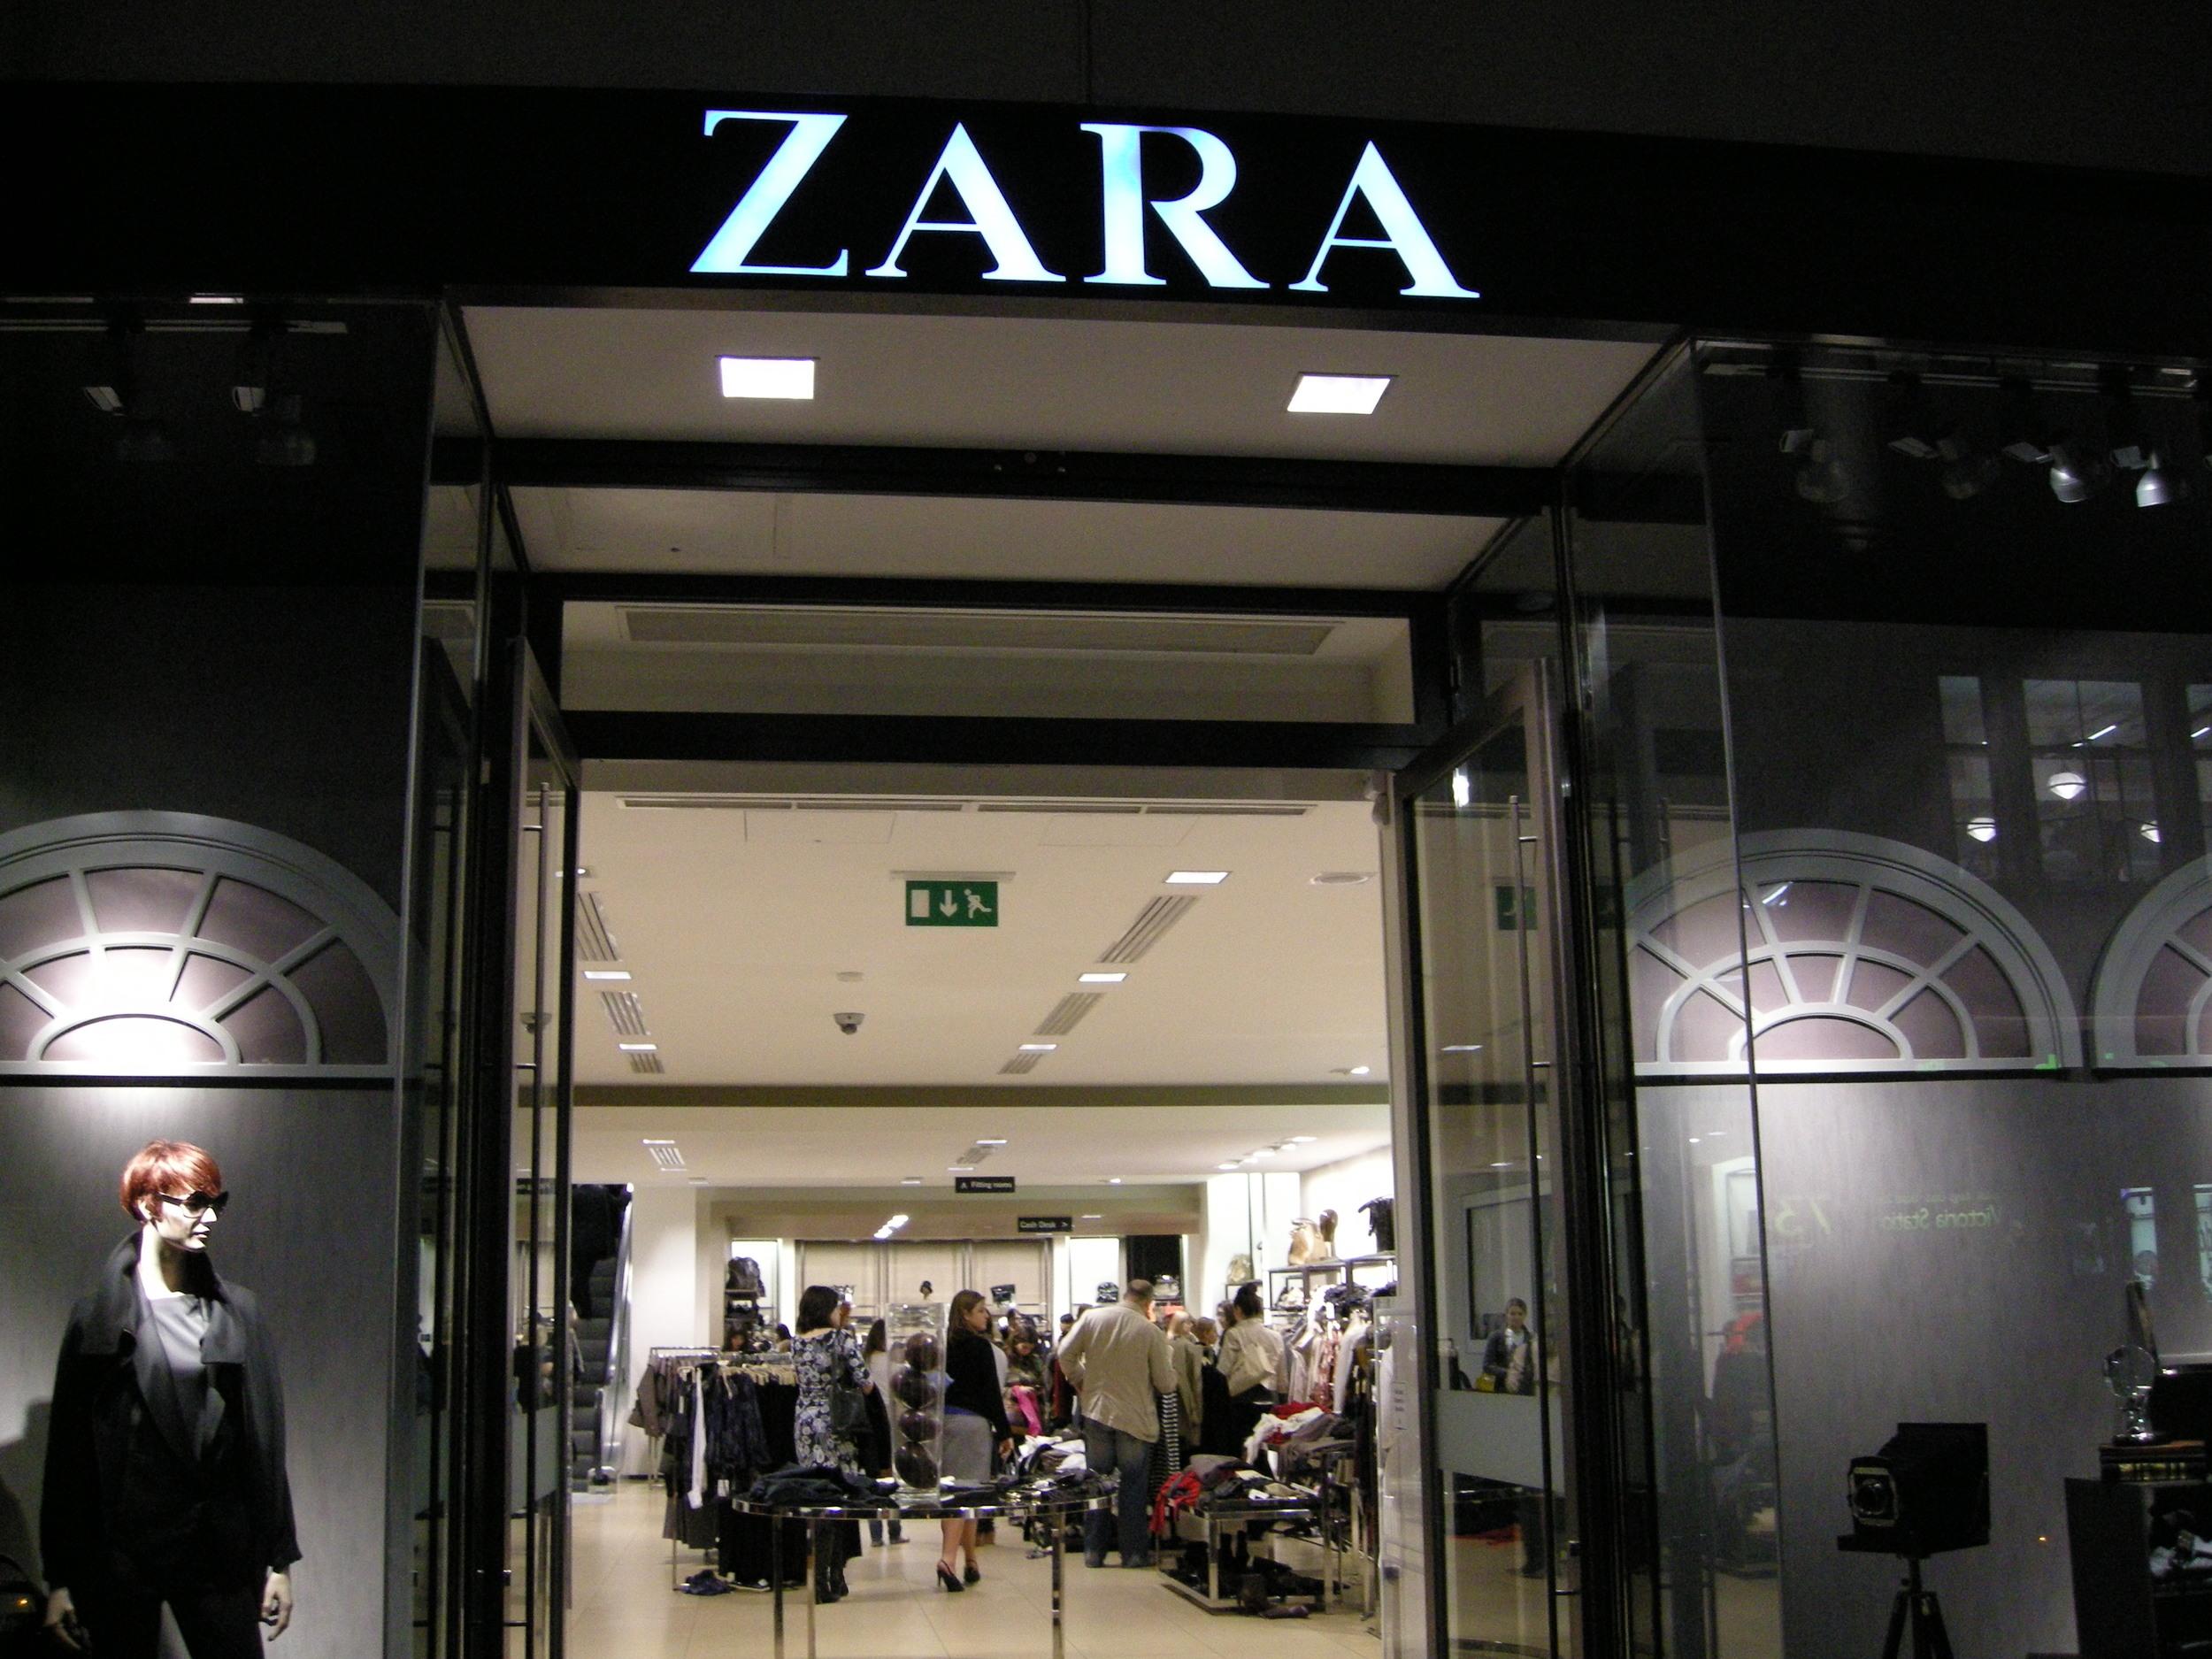 Zara; London, England